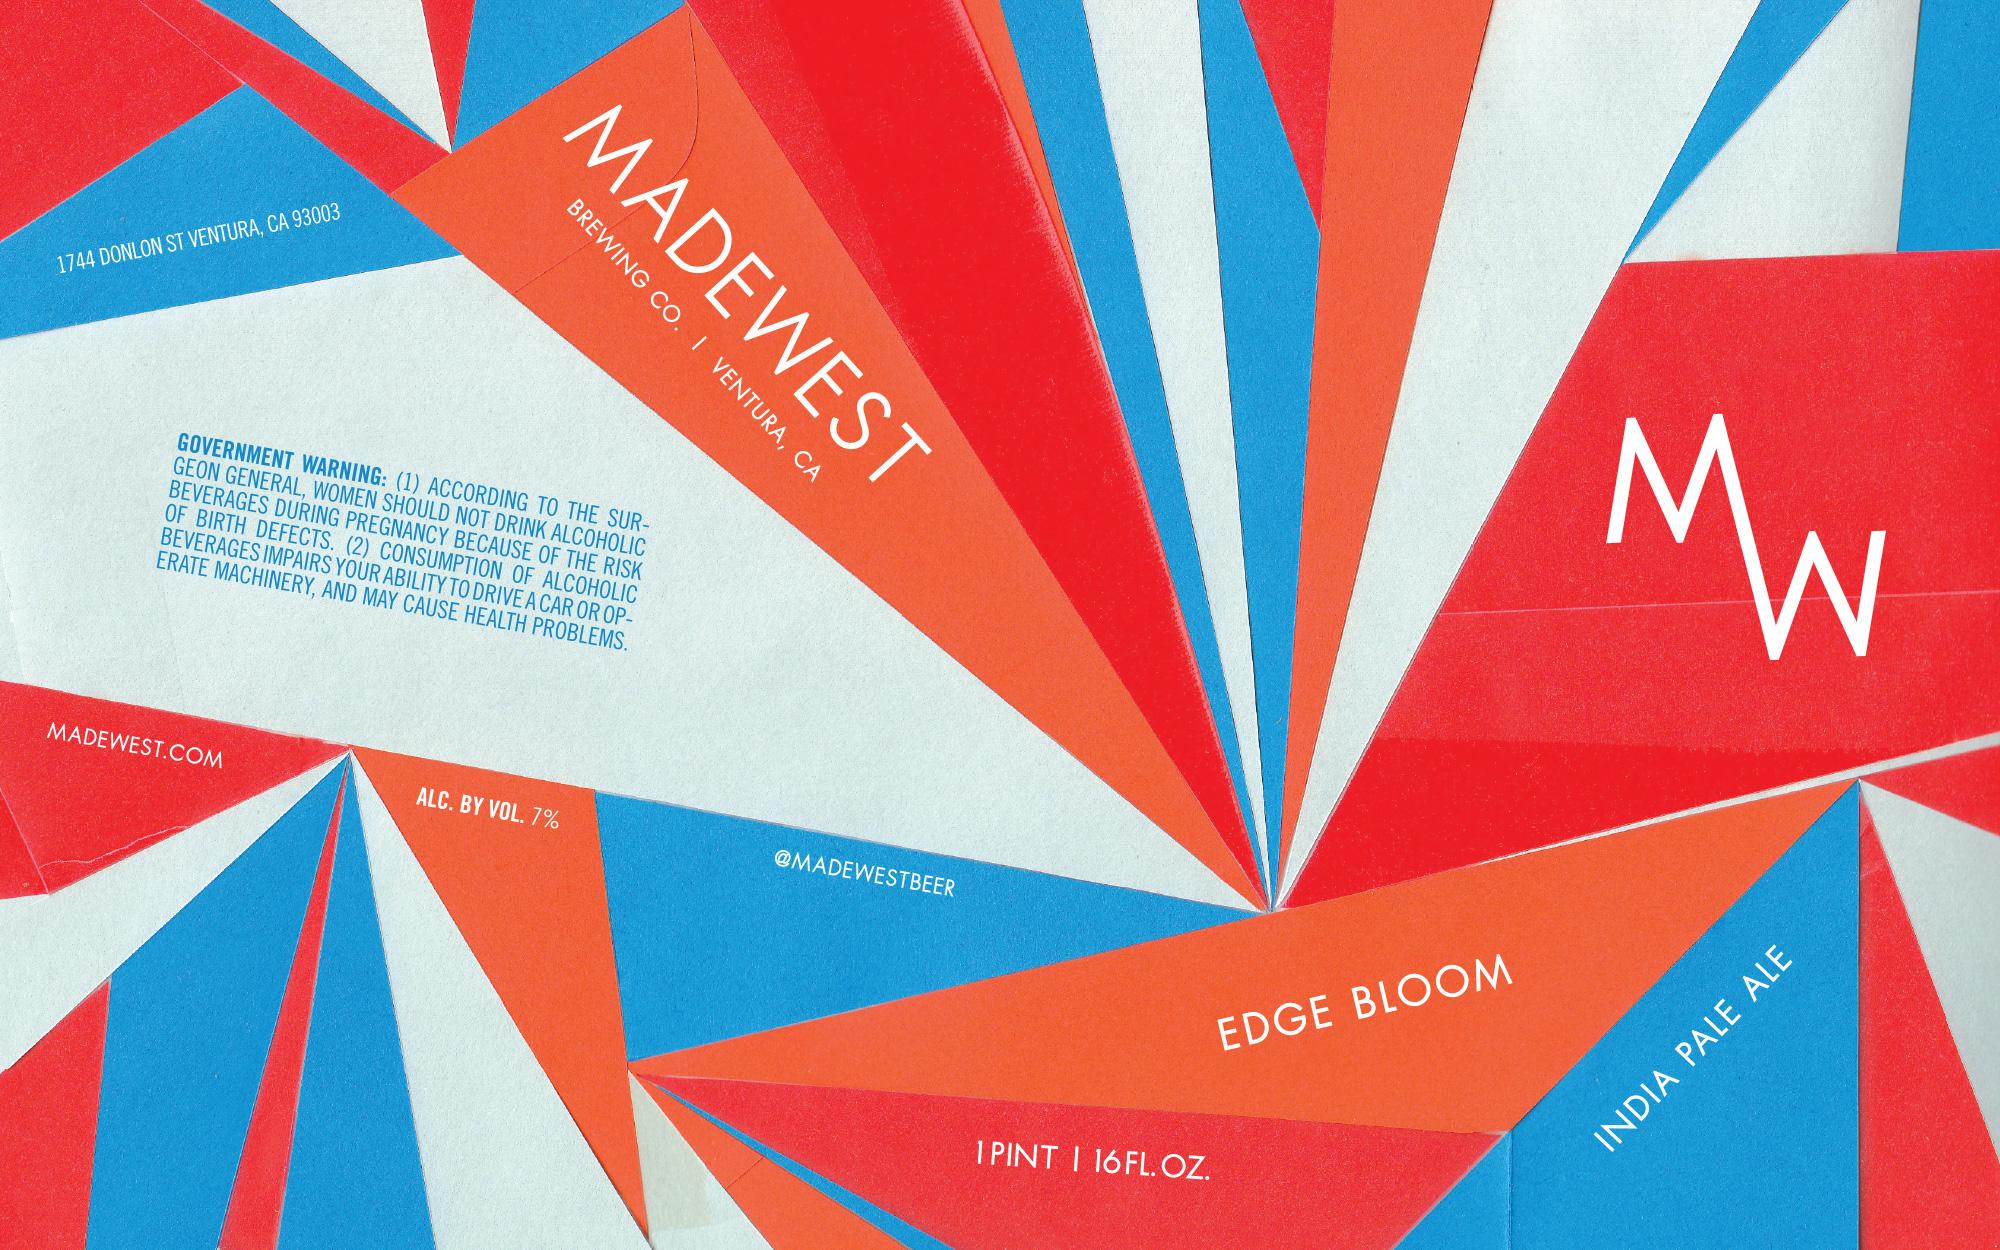 MW_Edge_bloom_can-sticker.jpg